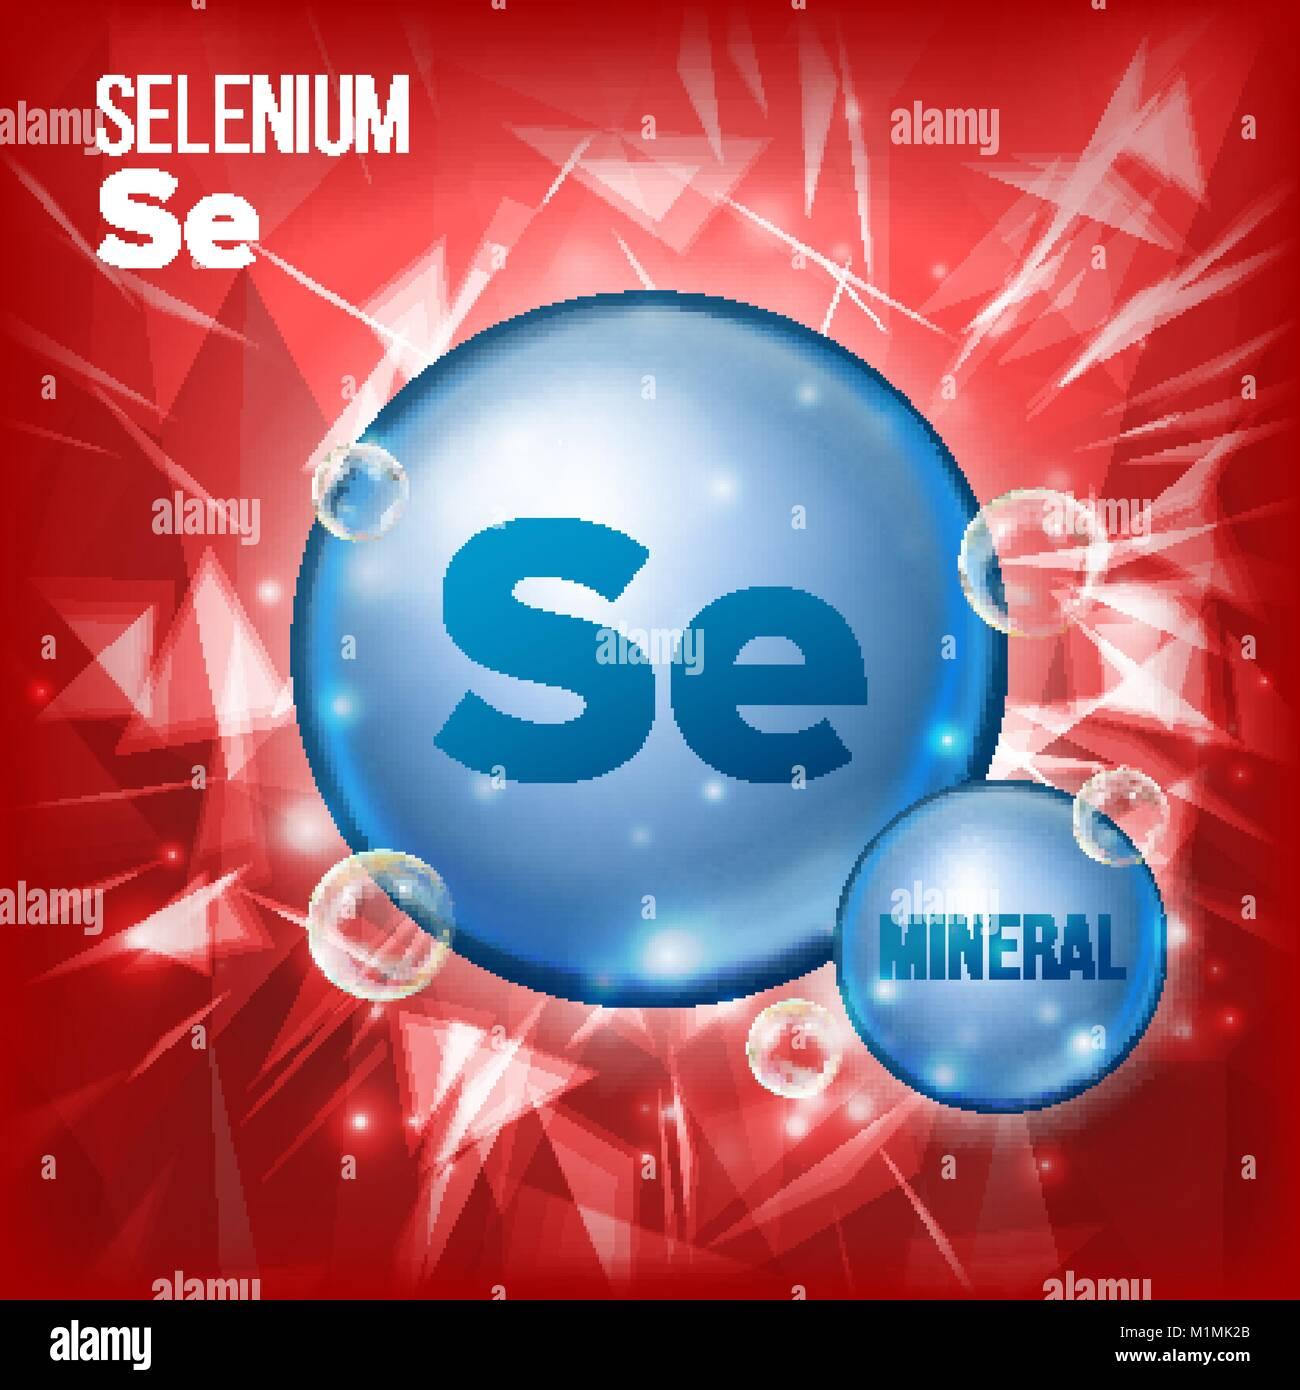 Chemical symbol for selenium images symbol and sign ideas se selenium vector mineral blue pill icon vitamin capsule pill mineral blue pill icon vitamin capsule buycottarizona